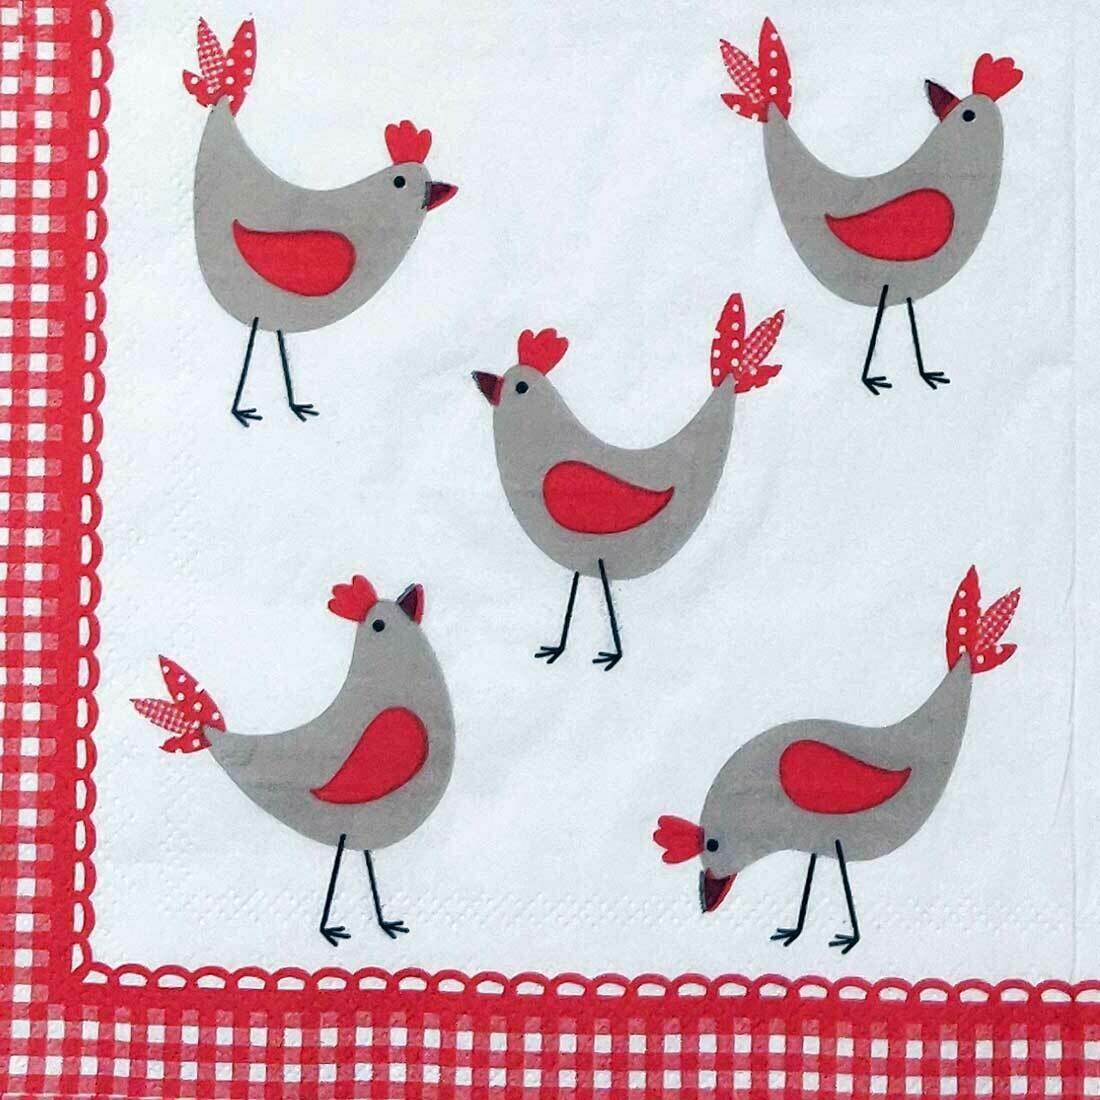 Chicken Print Paper Napkin 13x13 - (Pack of 20)